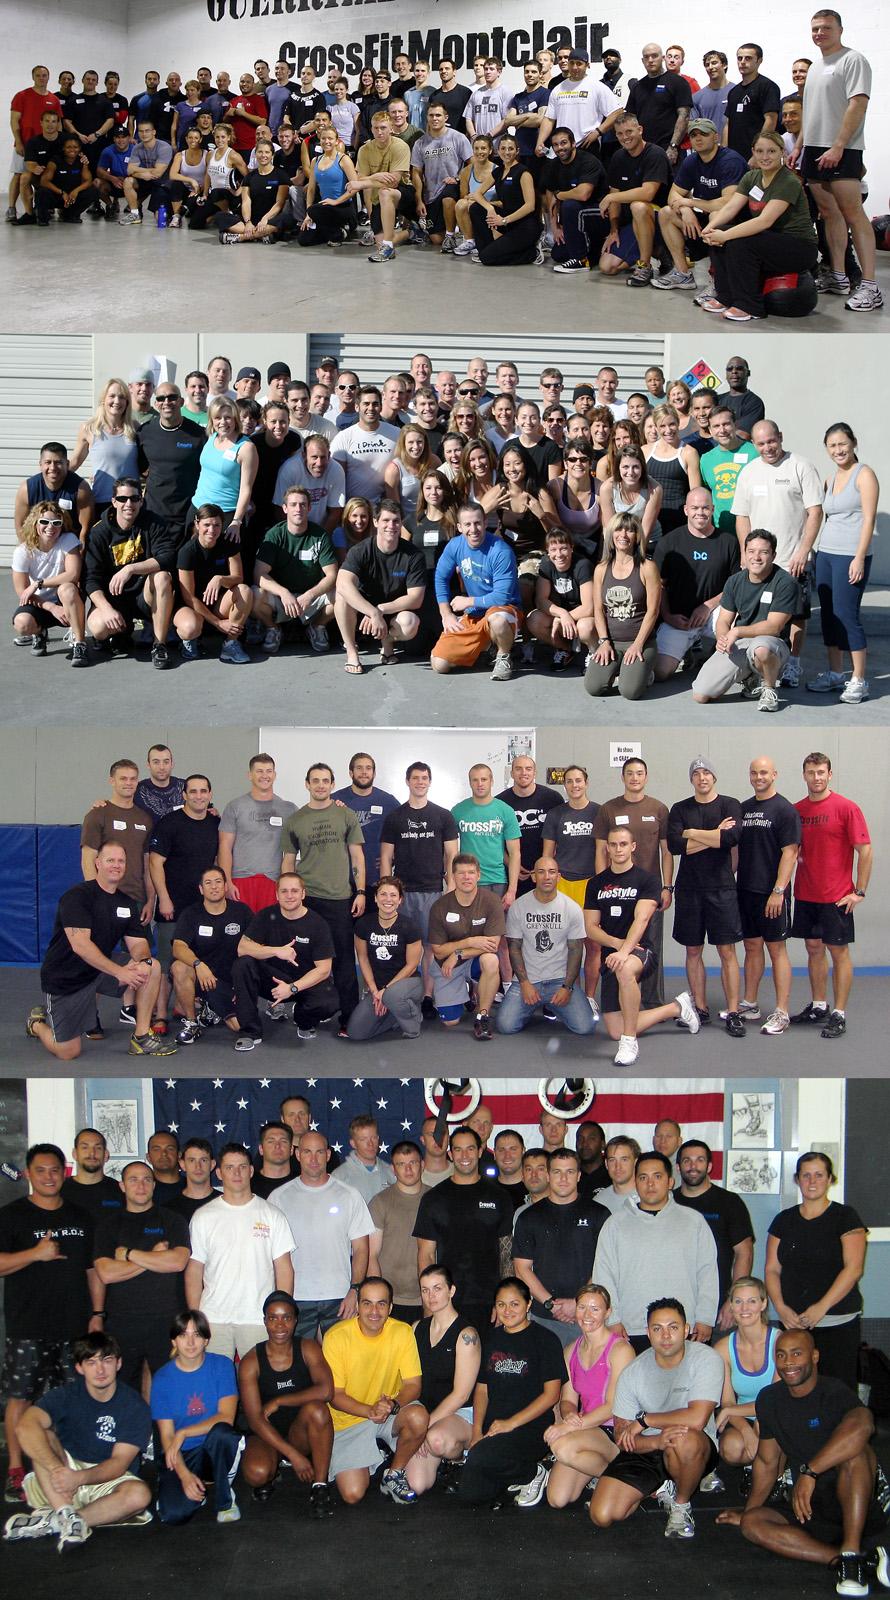 CrossFit: Forging Elite Fitness: Monday 081117